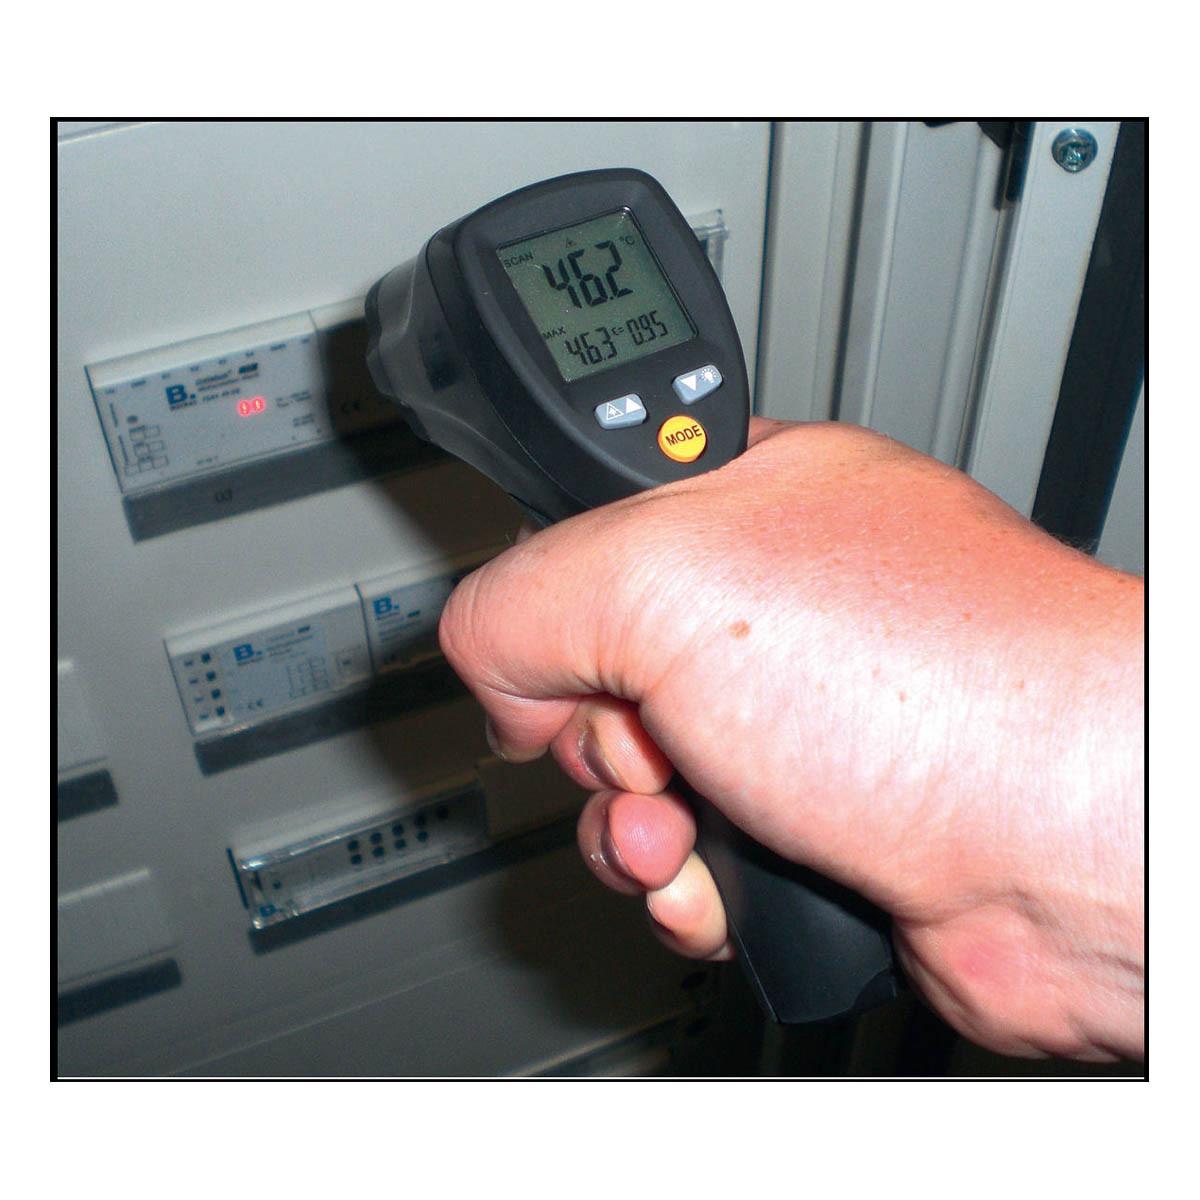 31-1124-infrarot-thermometer-scantemp-485-anwendung5-1200x1200px.jpg